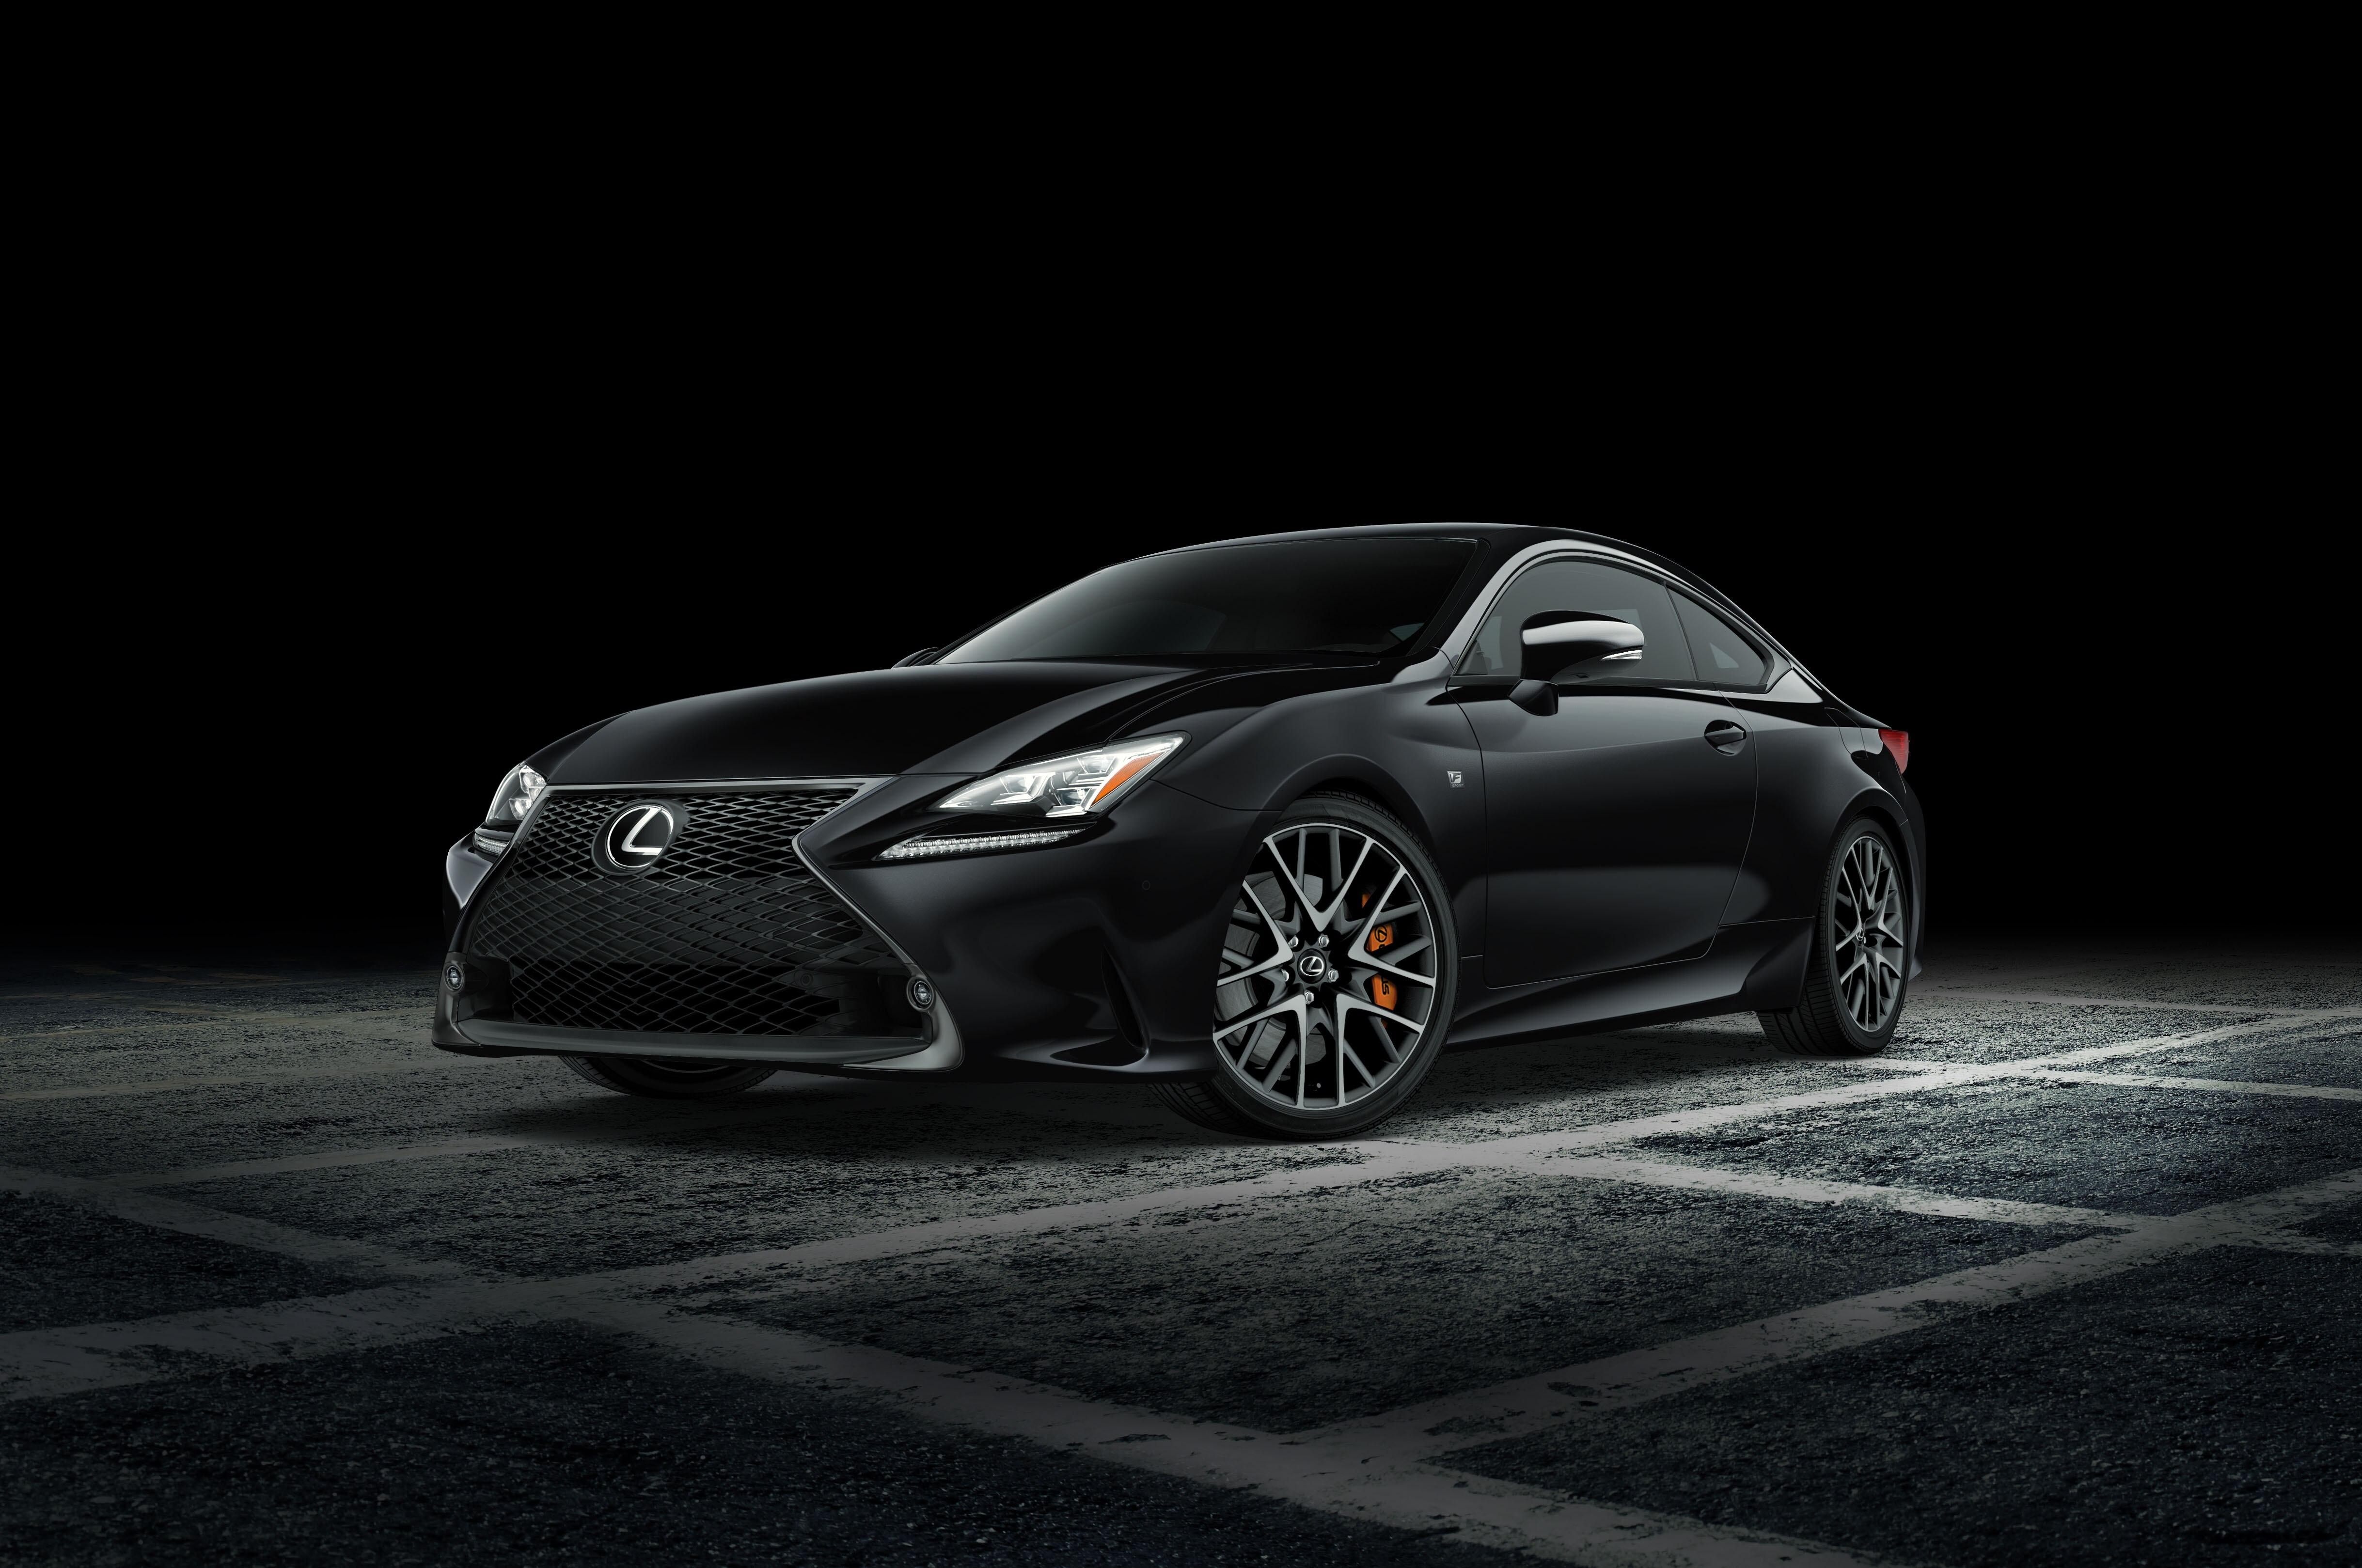 2018 Lexus RC F Sport Black Line Special Edition